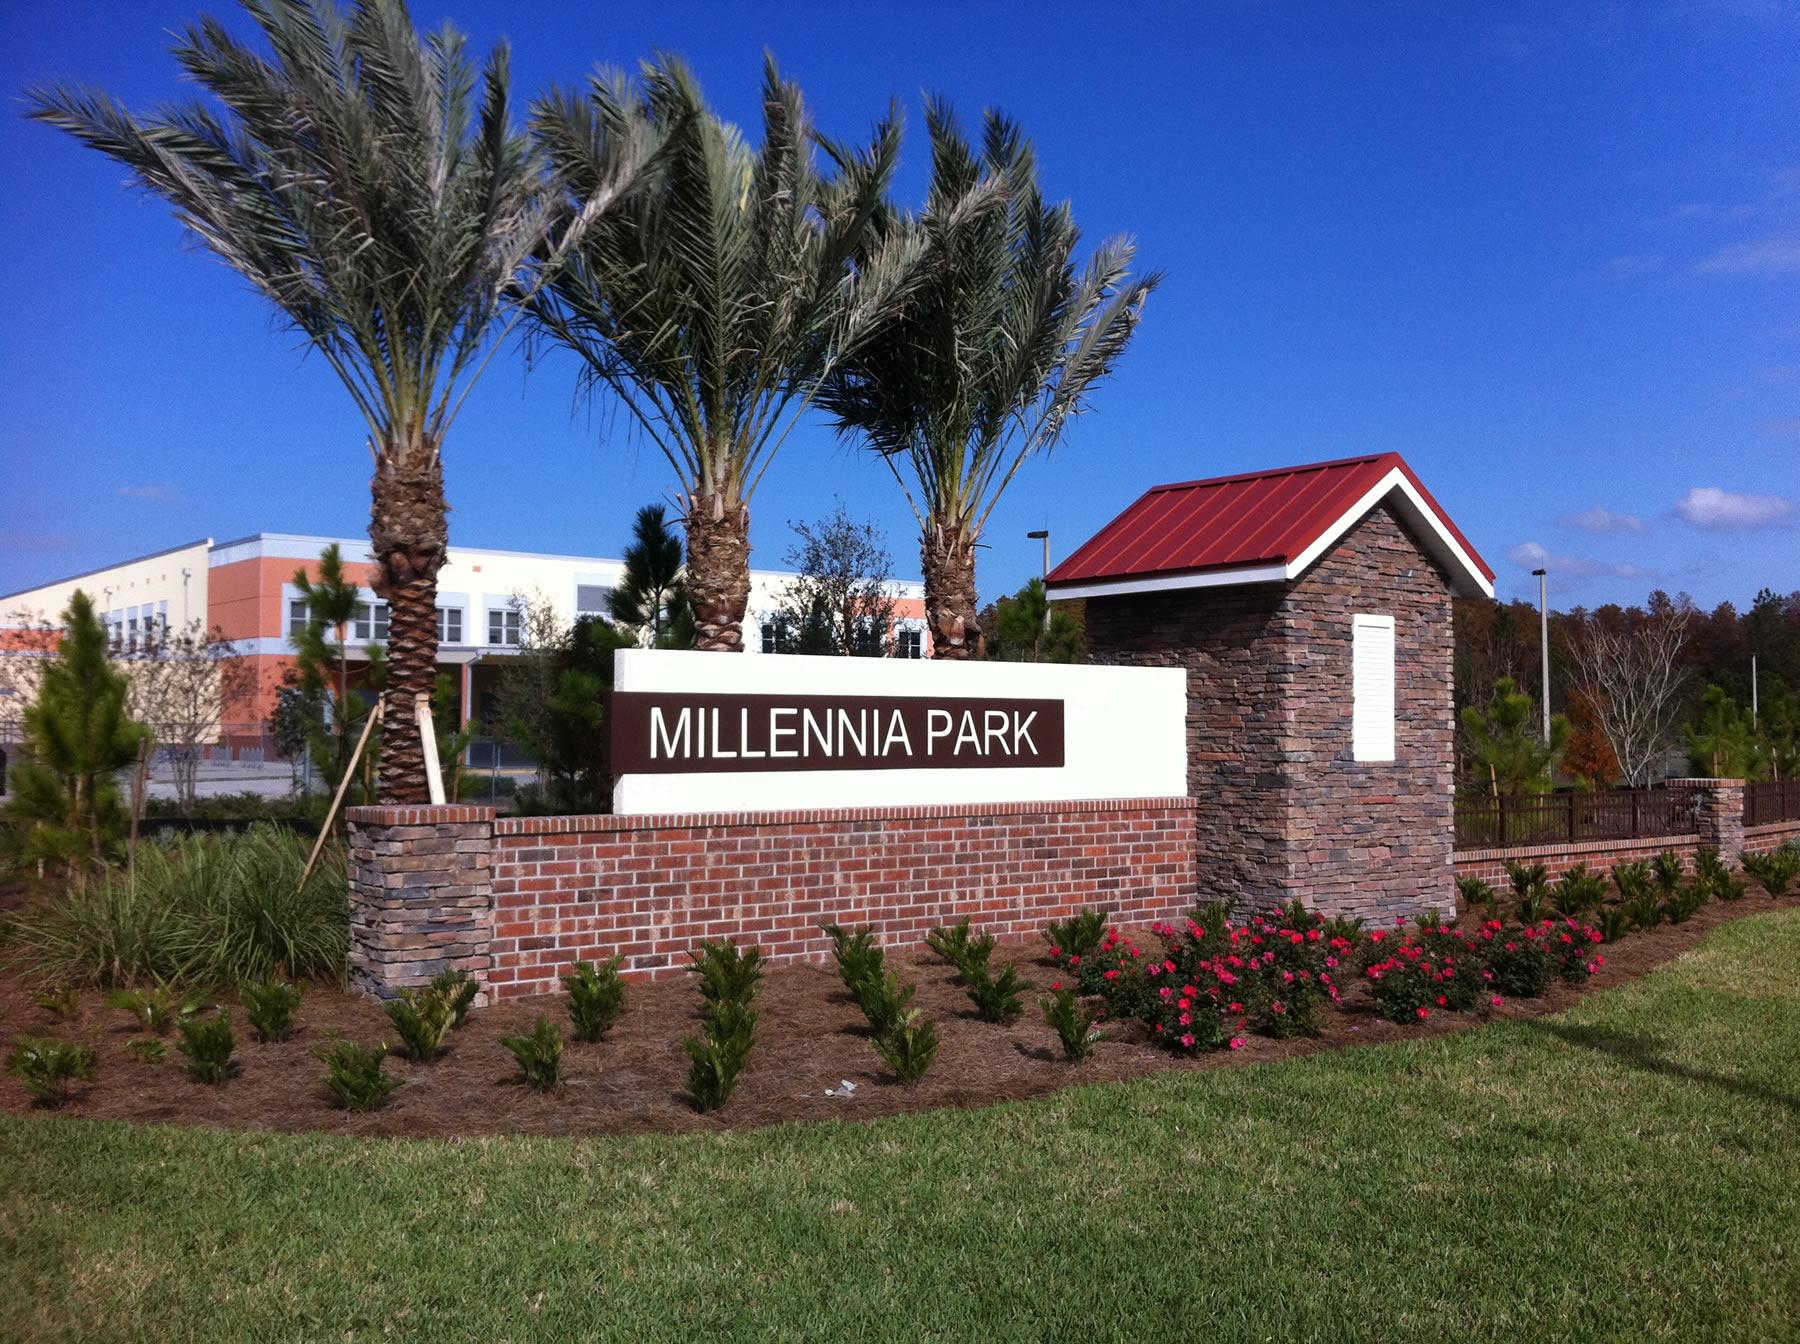 Millennia Park entry 1